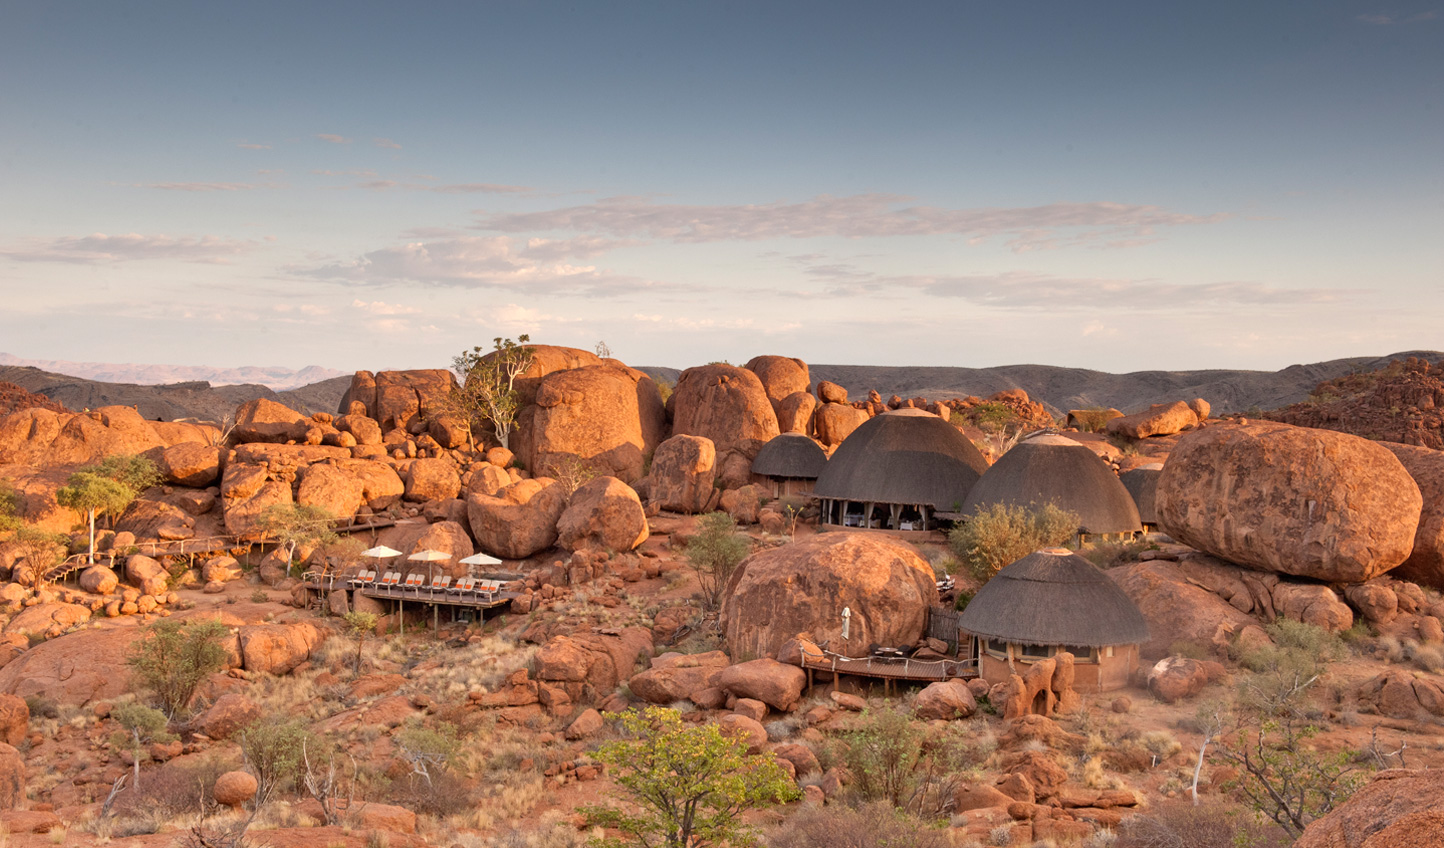 Tucked away amongst the dusty desert boulders lies Mowani Mountain Camp